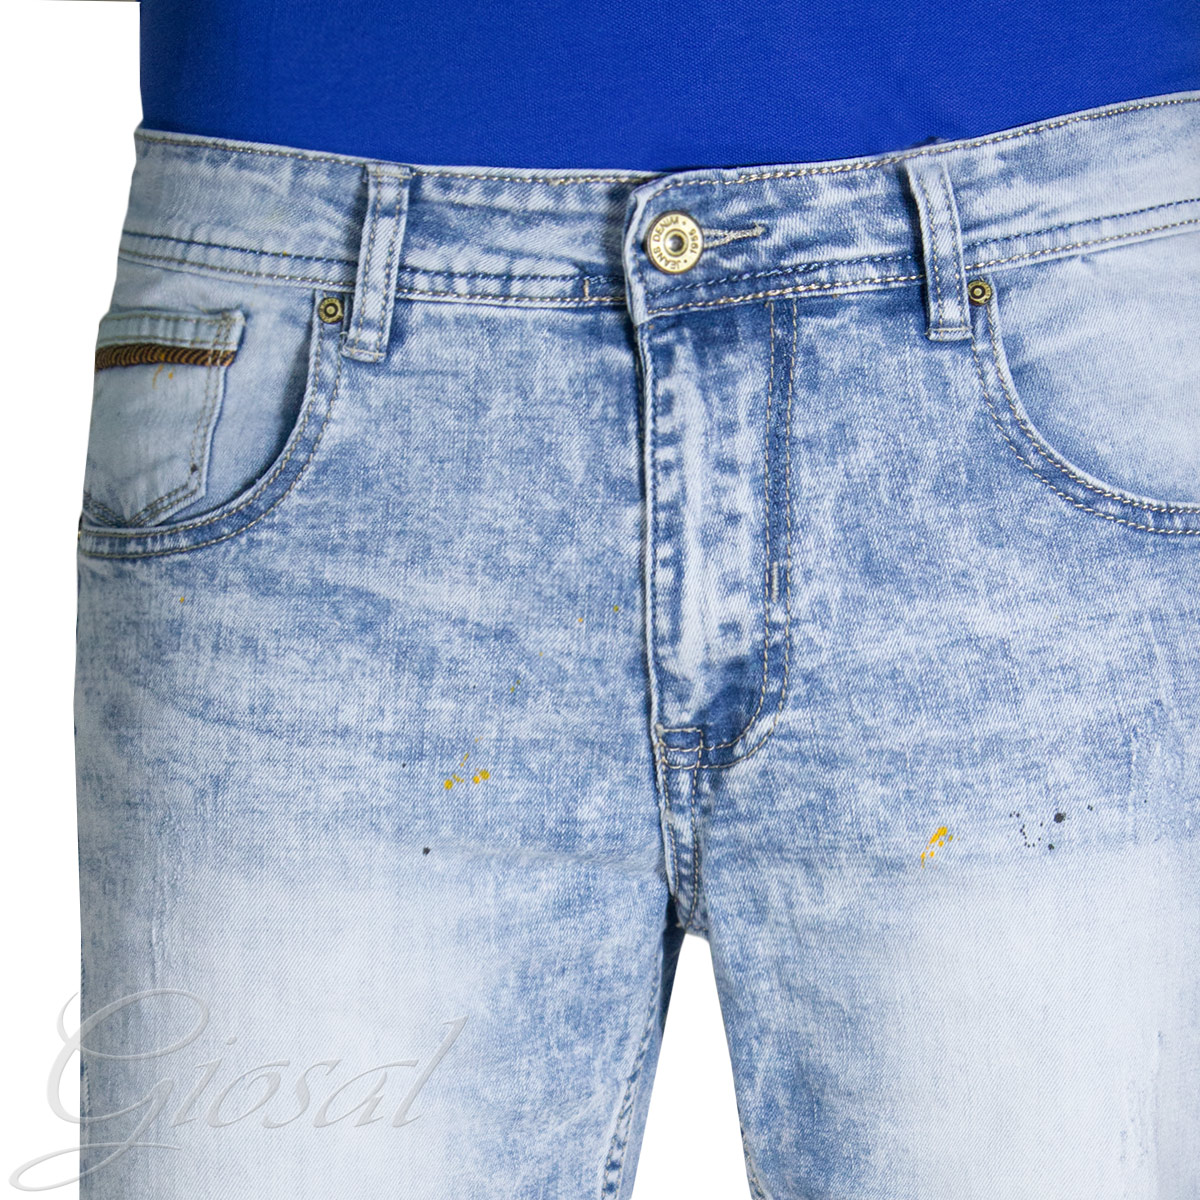 Pantalone-Uomo-Corto-Bermuda-Denim-Jeans-Macchie-Di-Pitture-Cinque-Tasche-GIOSAL miniatura 3